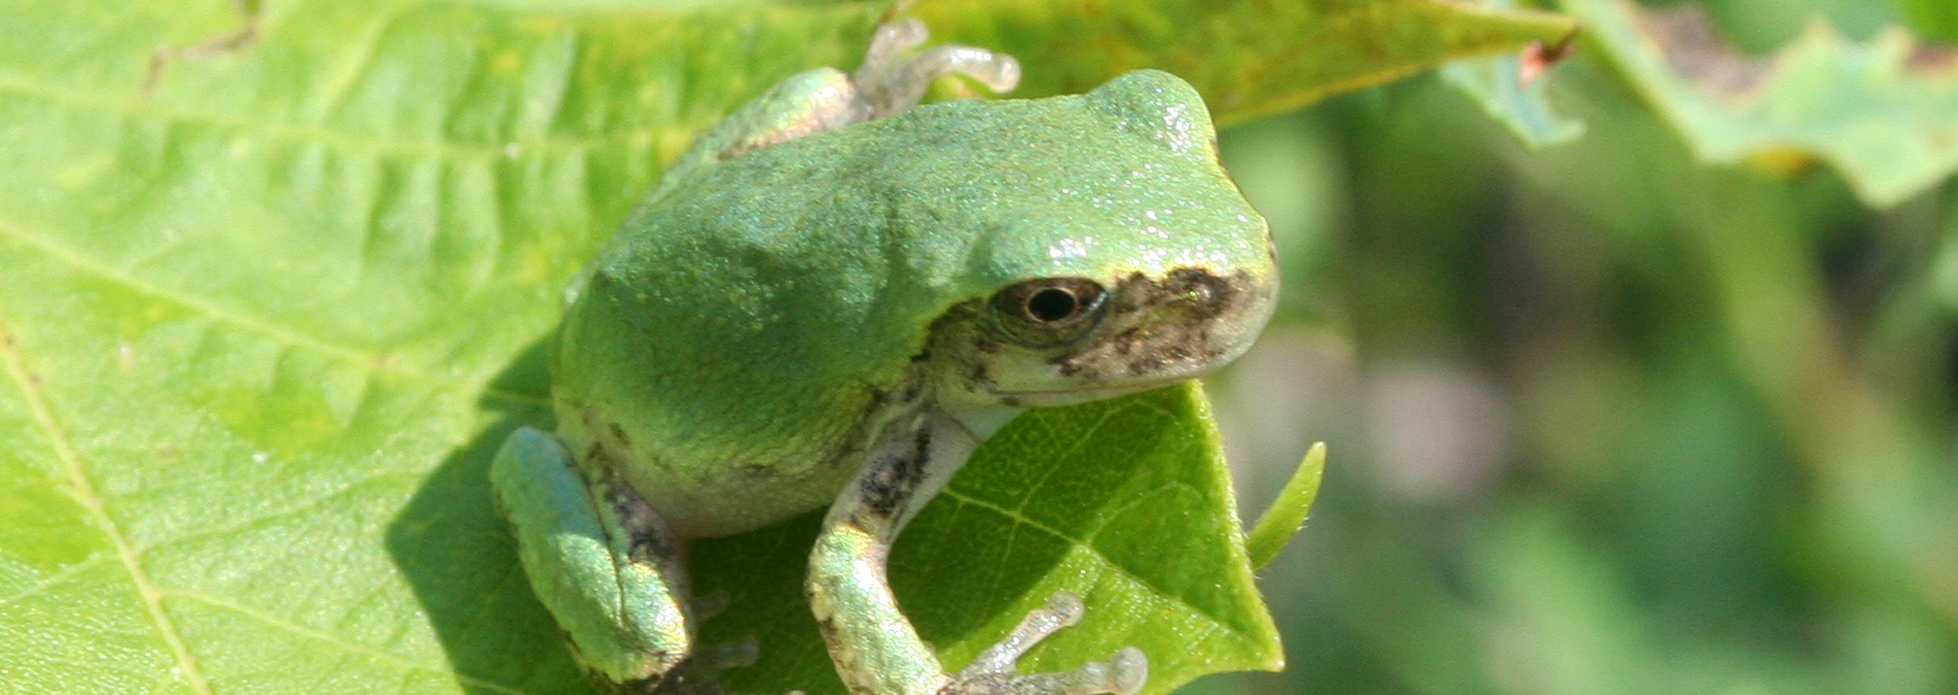 Gray Treefrog | Reptiles & Amphibians in Ontario | Ontario Nature